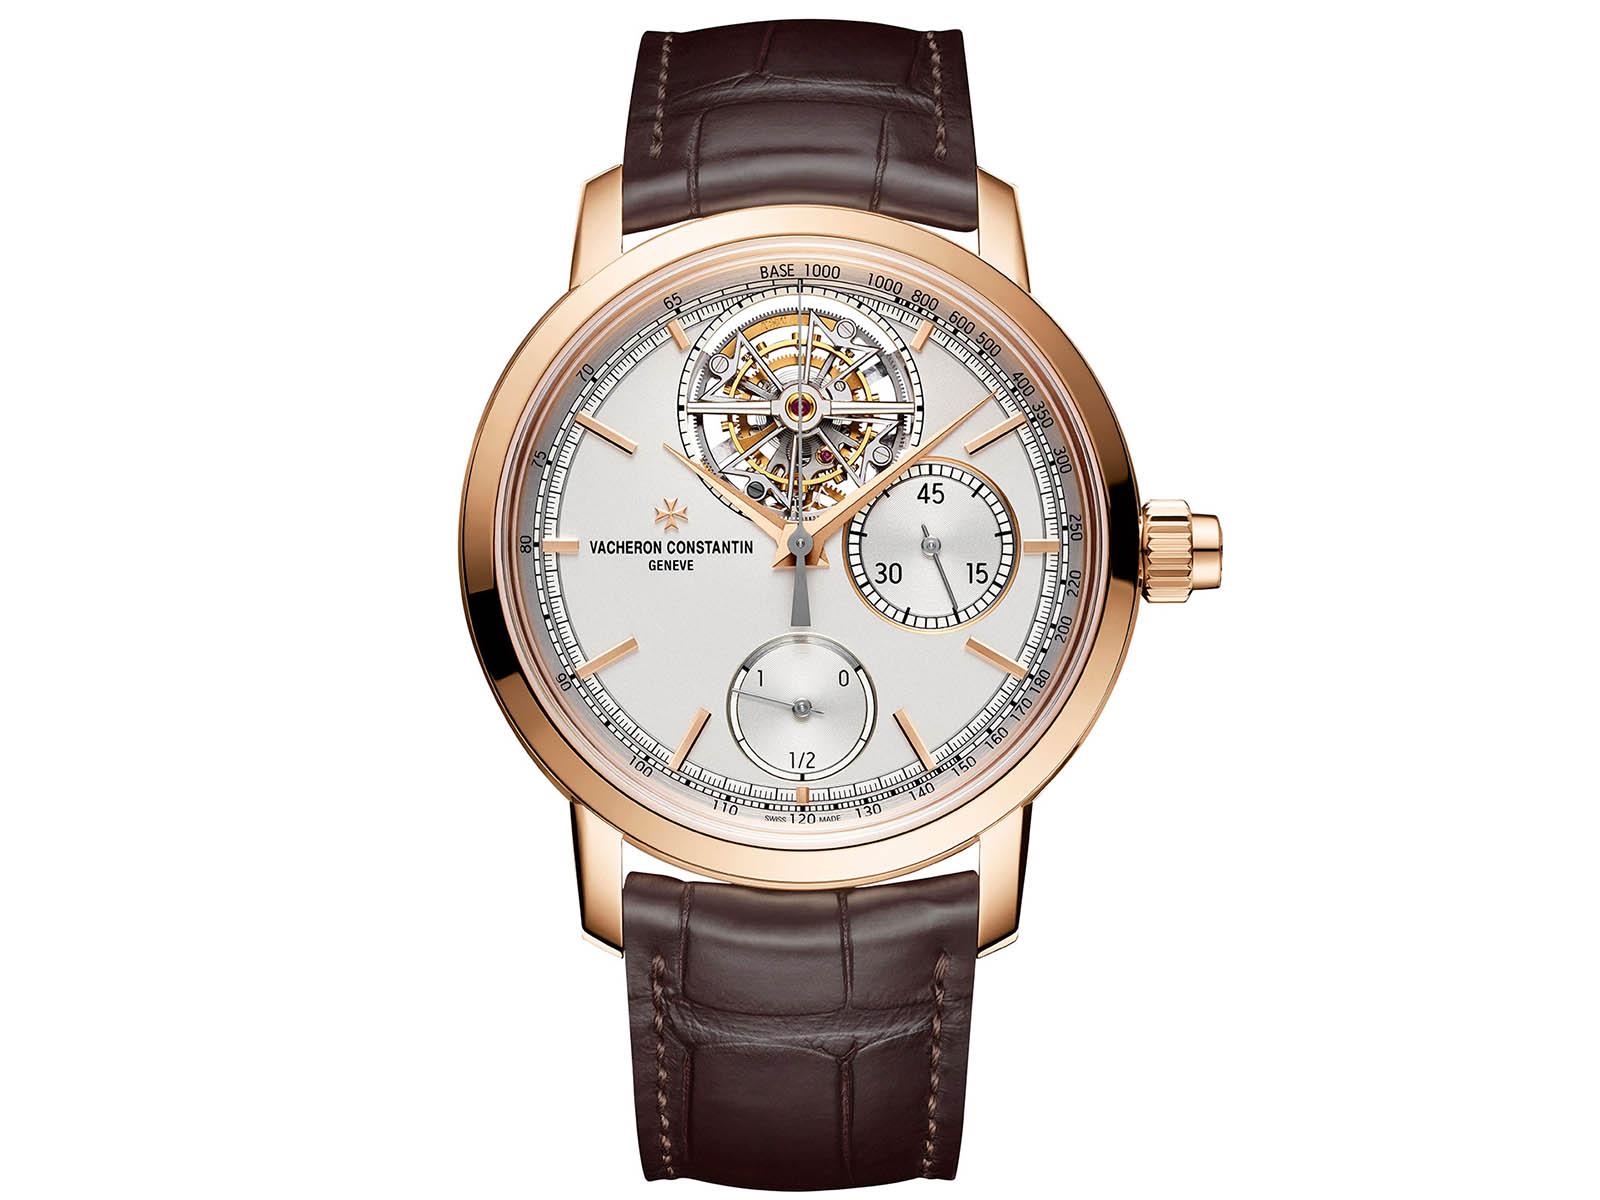 5100t-000r-b623-vacheron-constantin-traditionnelle-tourbillon-chronograph-3.jpg